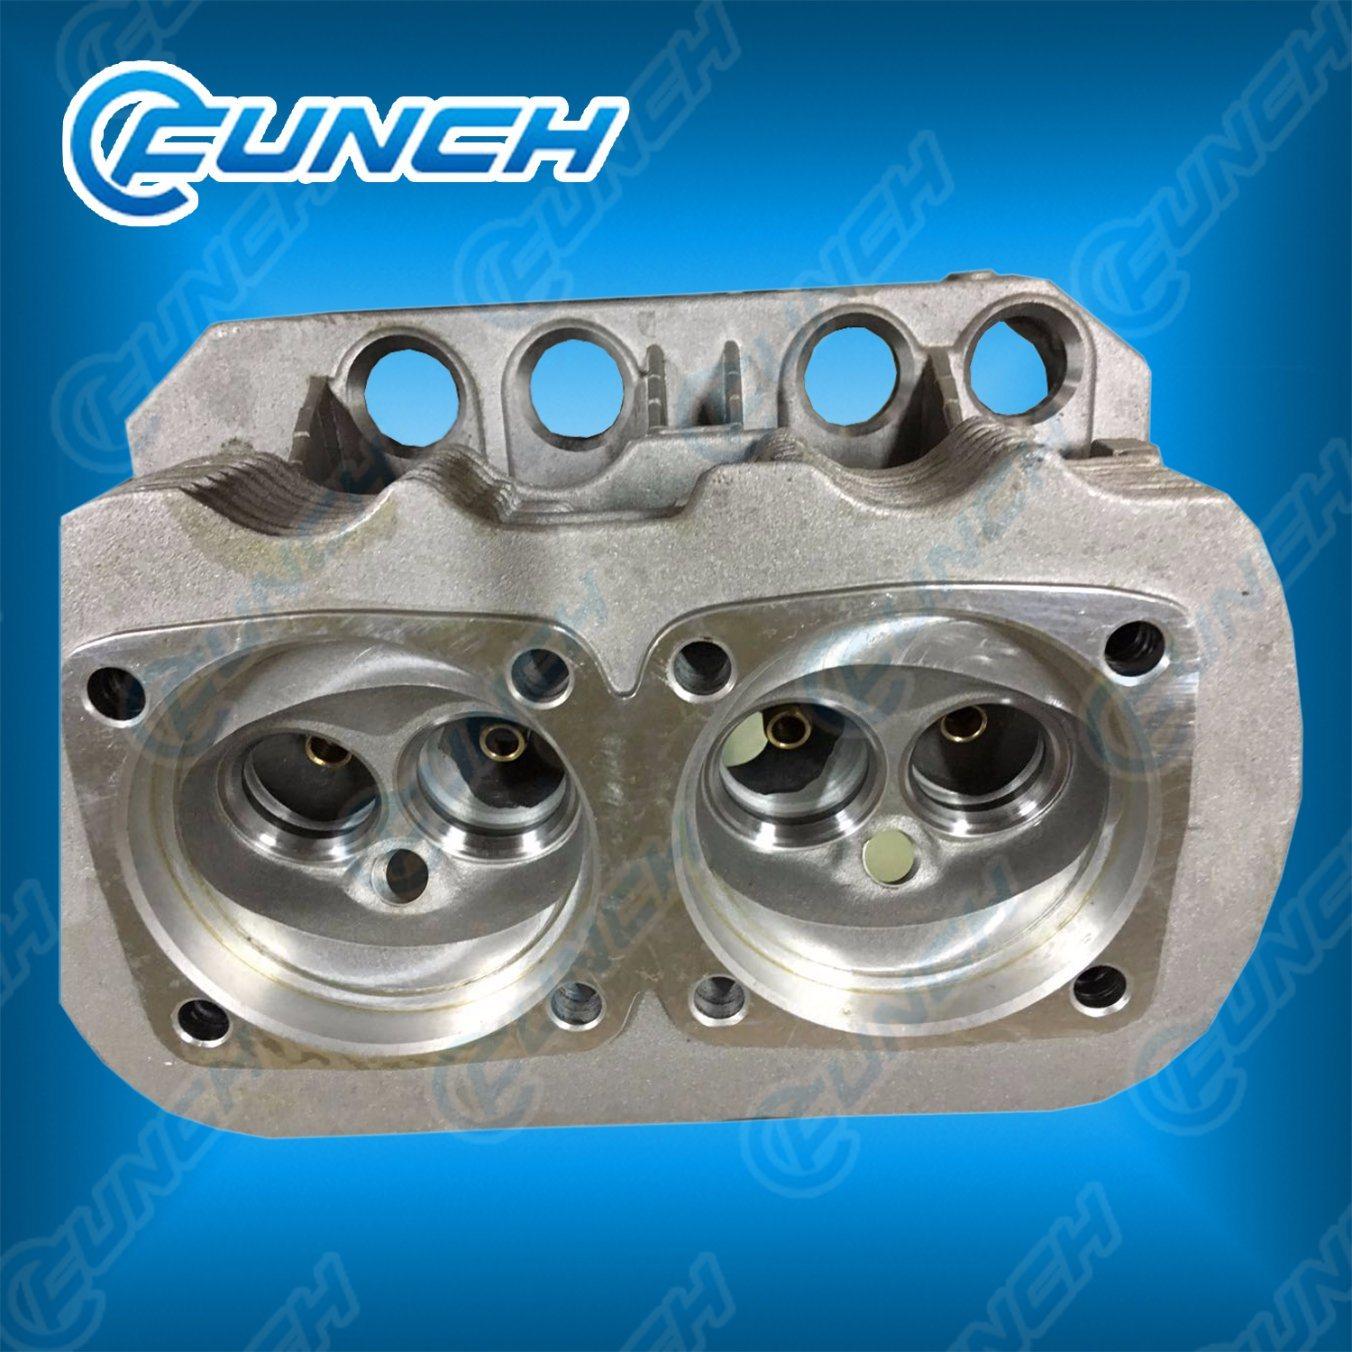 Cylinder Head for VW Beetle 043101375h, 4010135519, 040101375b, 41101275 5    IBUYautoparts com